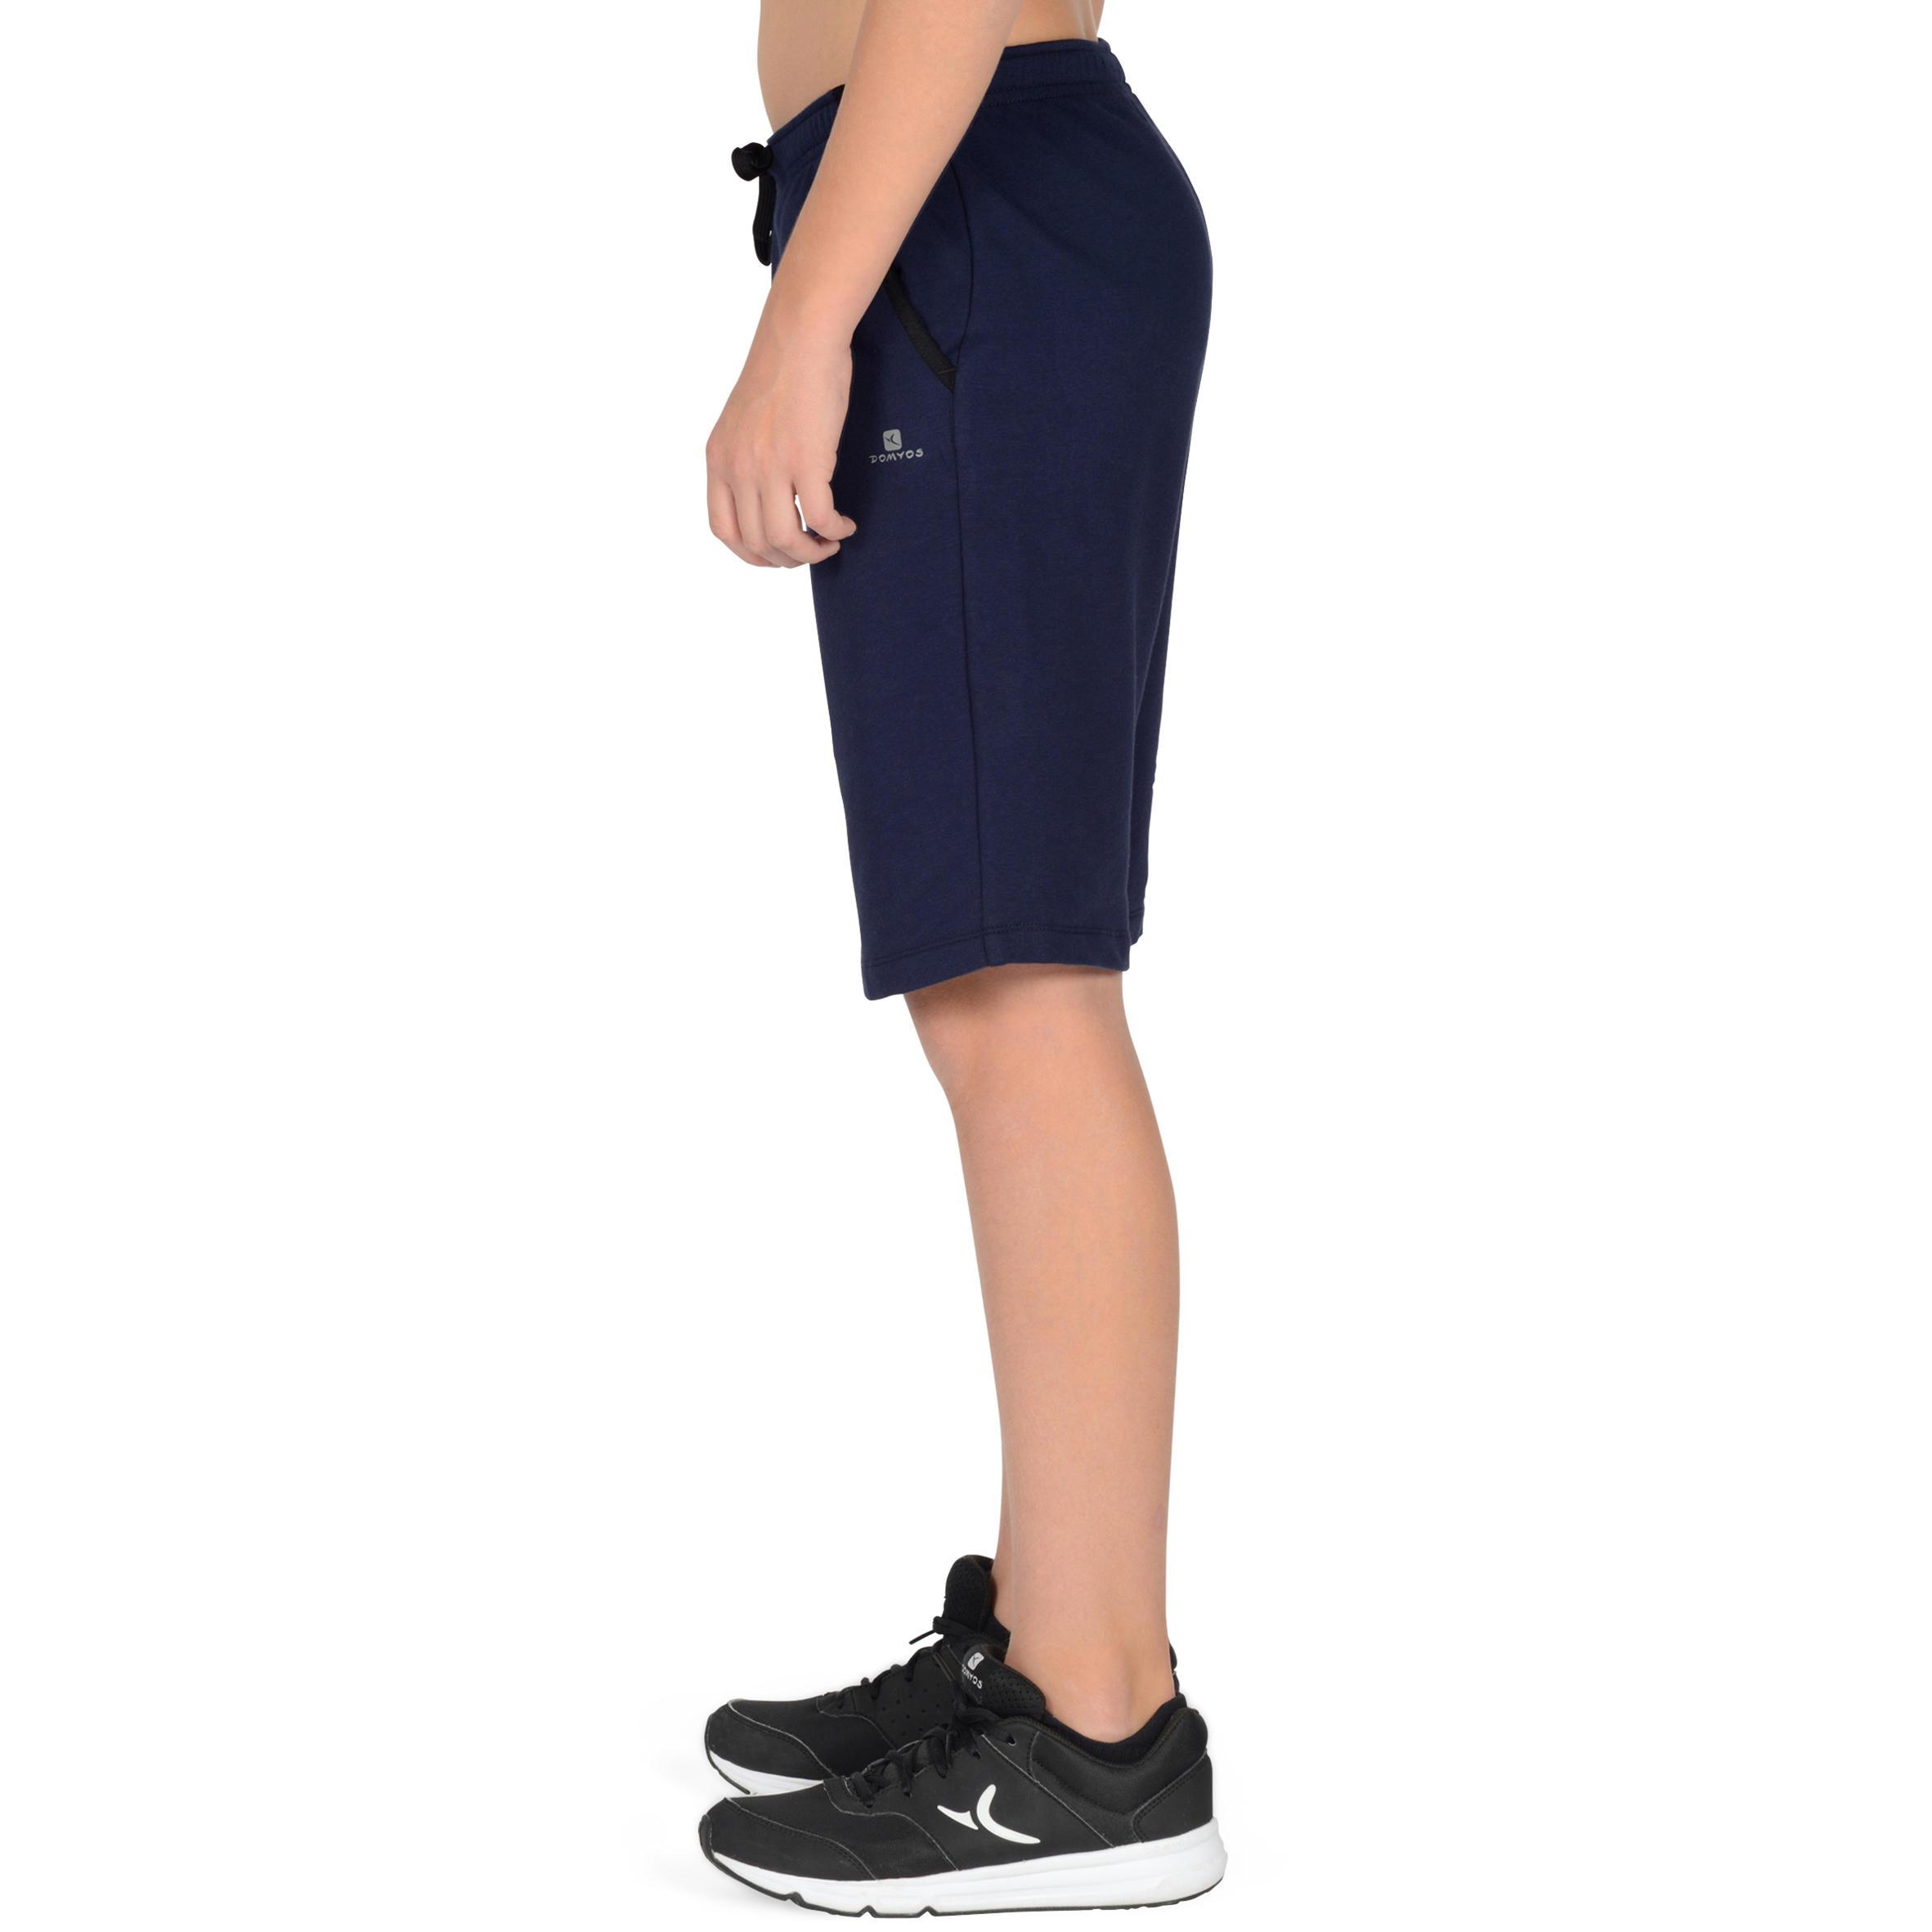 500 Boys' Gym Shorts with Pockets - Navy